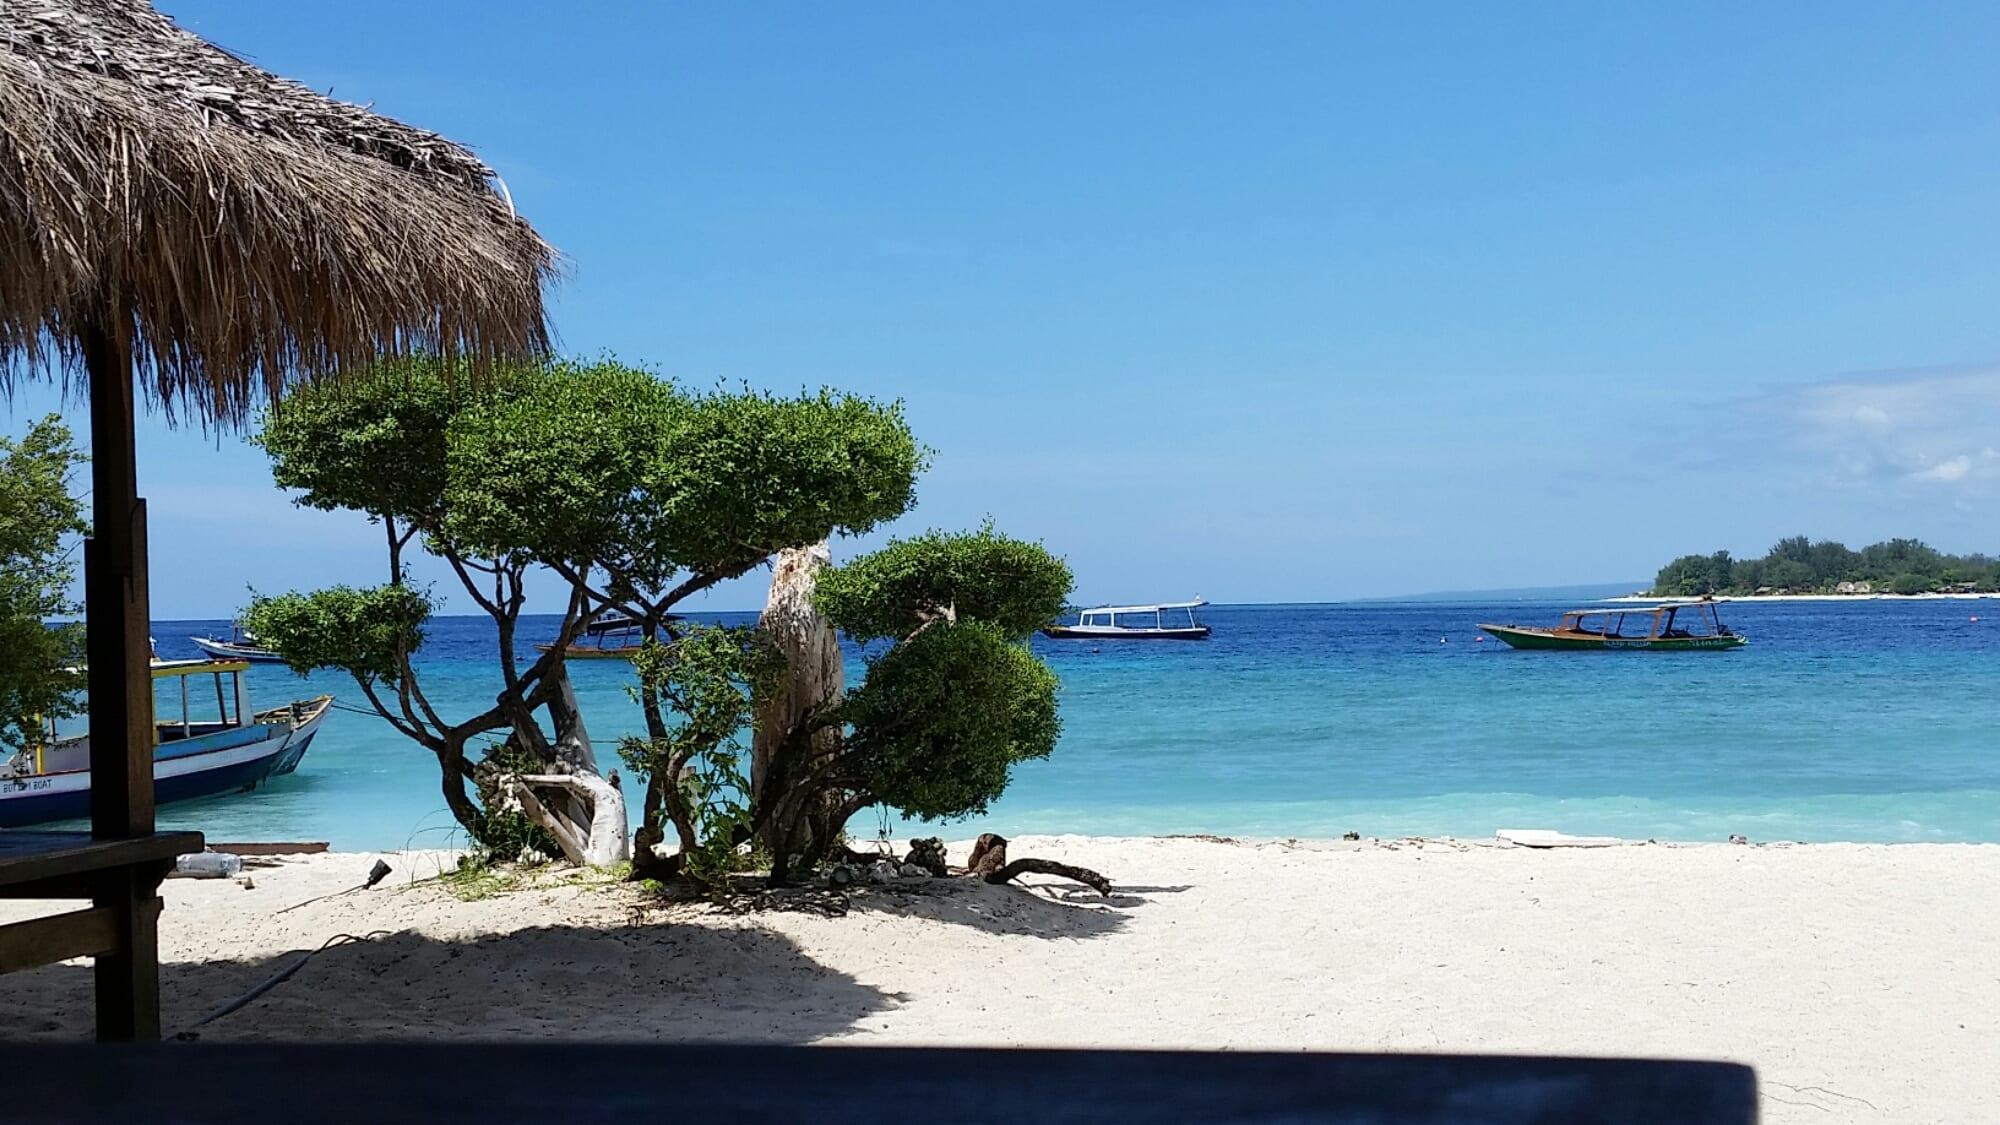 Bali cover image